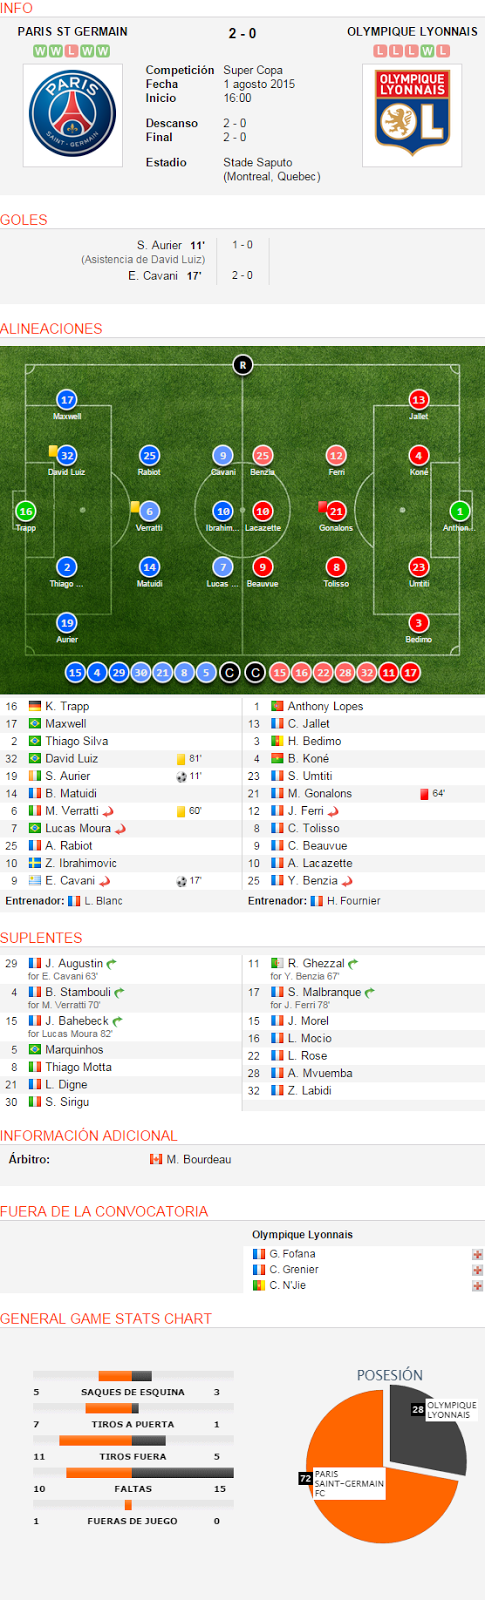 INFO PARIS ST GERMAIN WWLWW 2 - 0  OLYMPIQUE LYONNAIS LLLWL  Paris Saint-Germain FC CompeticiónSuper CopaFecha1 agosto 2015Inicio 16:00 Descanso2 - 0Final2 - 0 EstadioStade Saputo (Montreal, Quebec)  Olympique Lyonnais GOLES S. Aurier 11'  (Asistencia de David Luiz)  1 - 0 E. Cavani 17'   2 - 0 ALINEACIONES  16 K. Trapp  17 Maxwell  2 Thiago Silva  32 David Luiz  81' 19 S. Aurier  11' 14 B. Matuidi  6 M. Verratti  Sustituido  60' 7 Lucas Moura  Sustituido  25 A. Rabiot  10 Z. Ibrahimovic  9 E. Cavani  Sustituido  17' Entrenador: L. Blanc 1 Anthony Lopes  13 C. Jallet  3 H. Bedimo  4 B. Koné  23 S. Umtiti  21 M. Gonalons  64' 12 J. Ferri  Sustituido  8 C. Tolisso  9 C. Beauvue  10 A. Lacazette  25 Y. Benzia  Sustituido  Entrenador: H. Fournier SUPLENTES 29  J. Augustin  Sustituido for E. Cavani 63' 4  B. Stambouli  Sustituido for M. Verratti 70' 15  J. Bahebeck  Sustituido for Lucas Moura 82' 5  Marquinhos 8  Thiago Motta 21  L. Digne 30  S. Sirigu 11  R. Ghezzal  Sustituido for Y. Benzia 67' 17  S. Malbranque  Sustituido for J. Ferri 78' 15  J. Morel 16  L. Mocio 22  L. Rose 28  A. Mvuemba 32  Z. Labidi INFORMACIÓN ADICIONAL Árbitro:M. Bourdeau FUERA DE LA CONVOCATORIA Olympique Lyonnais G. Fofana  C. Grenier  C. N'Jie  GENERAL GAME STATS CHART